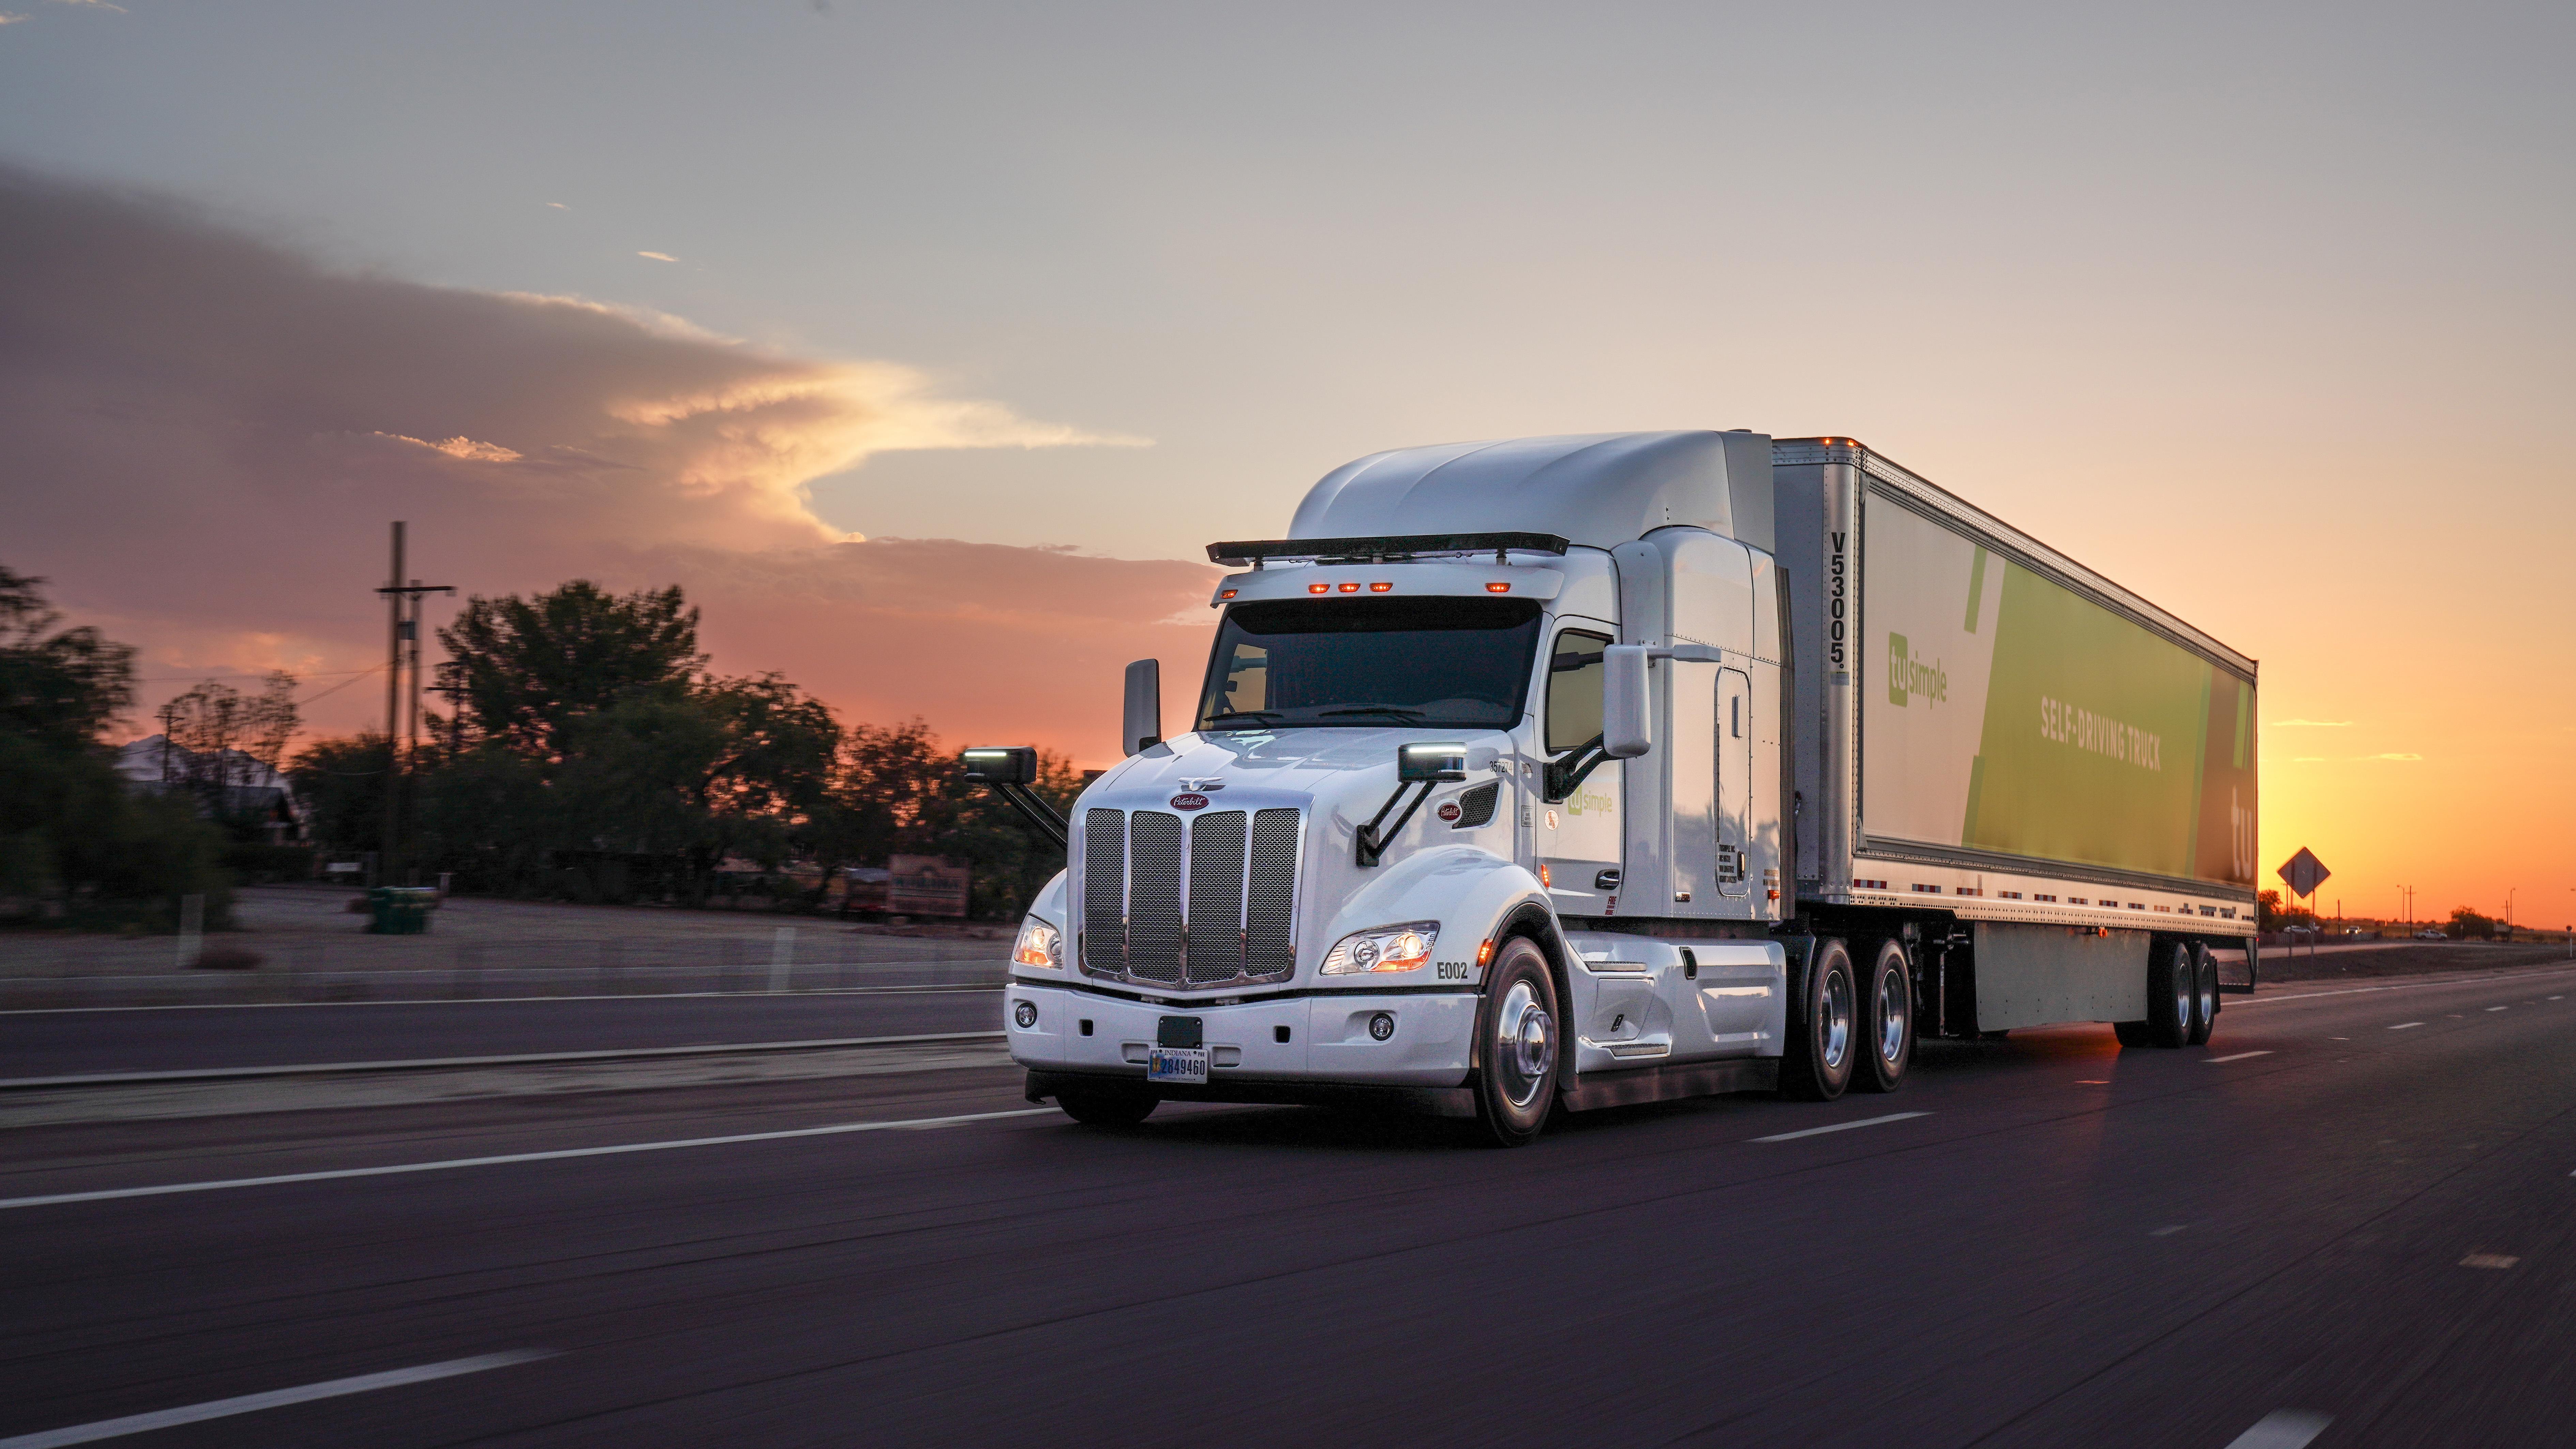 TuSimple self-driving truck autonomous vehicle